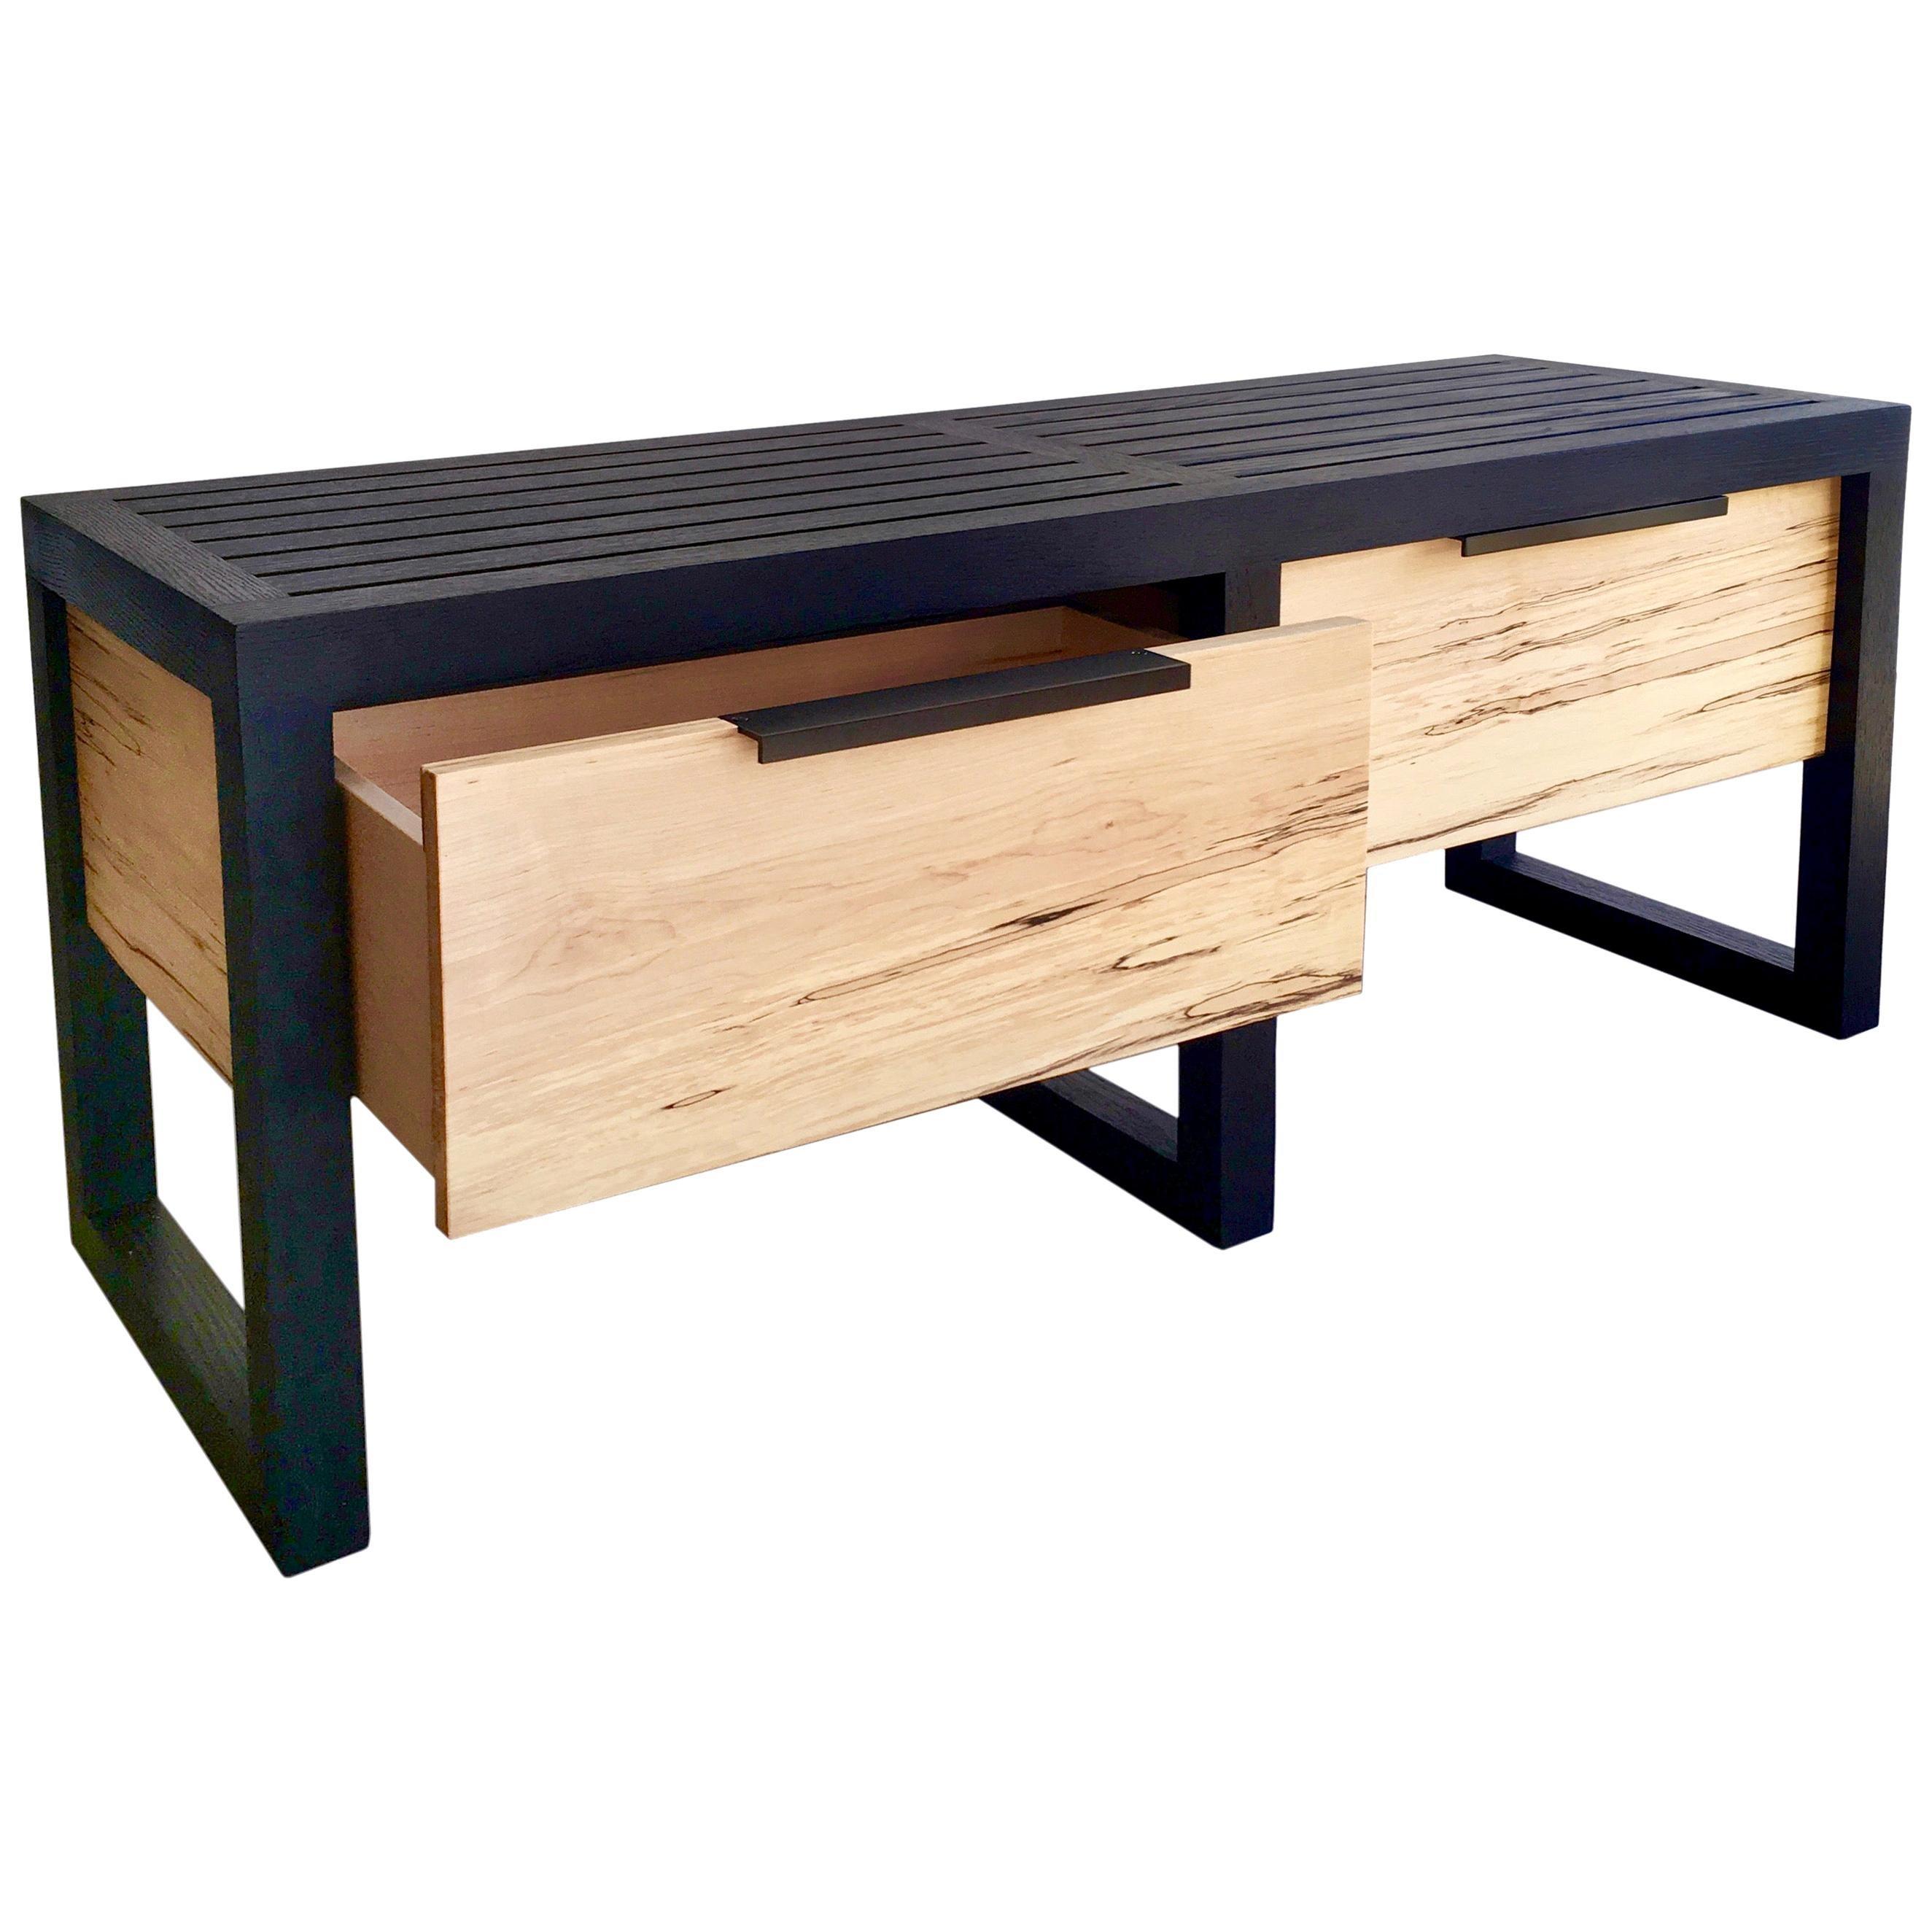 Lewis Slat Bench Midcentury Style with Drawers, Ebonized Oak and Spalted Maple